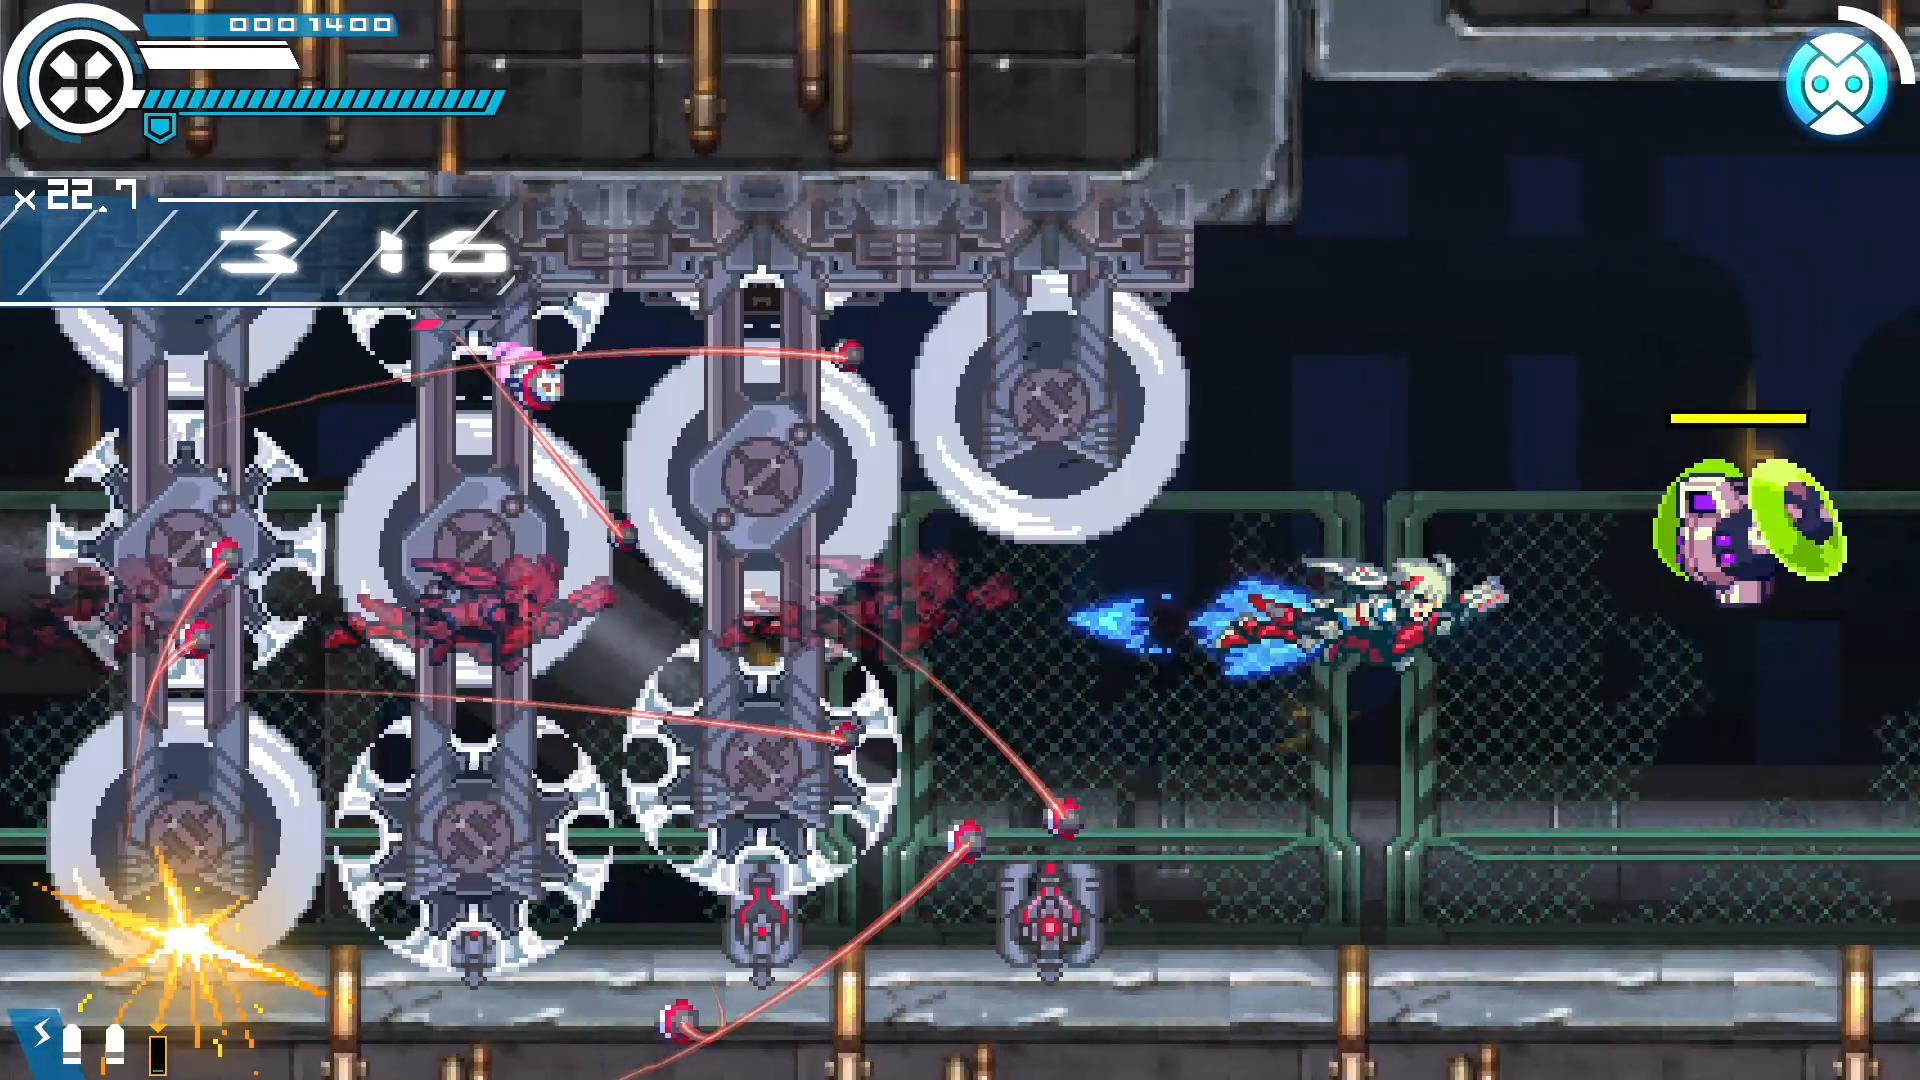 Gunvolt Chronicles: Luminous Avenger iX confirma su lanzamiento en Xbox One